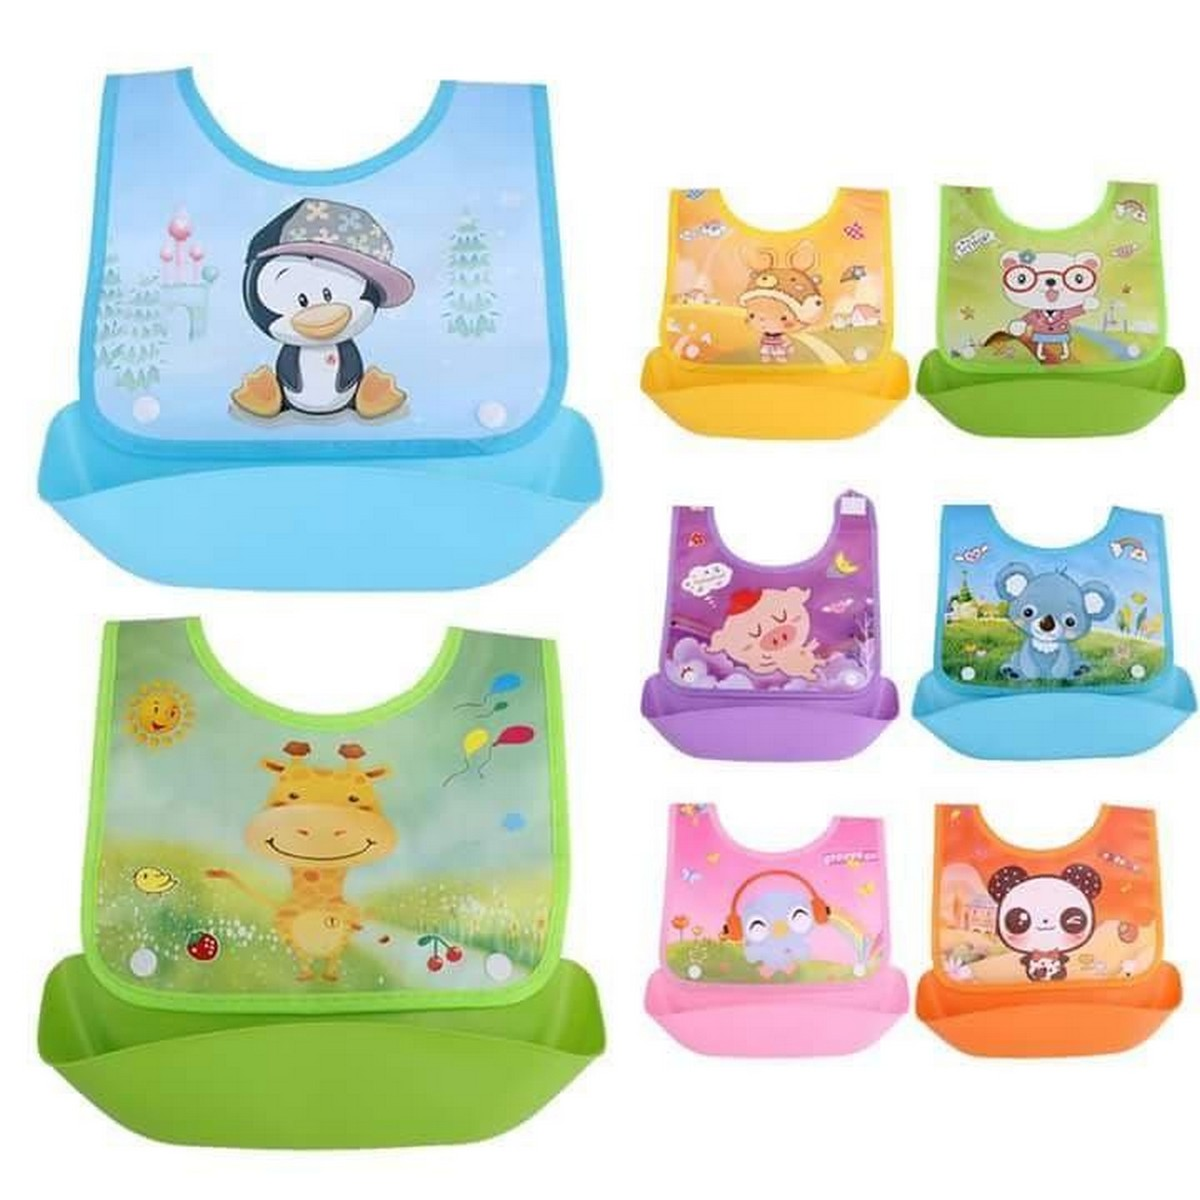 Waterproof Baby Plastic Bib - Multicolor